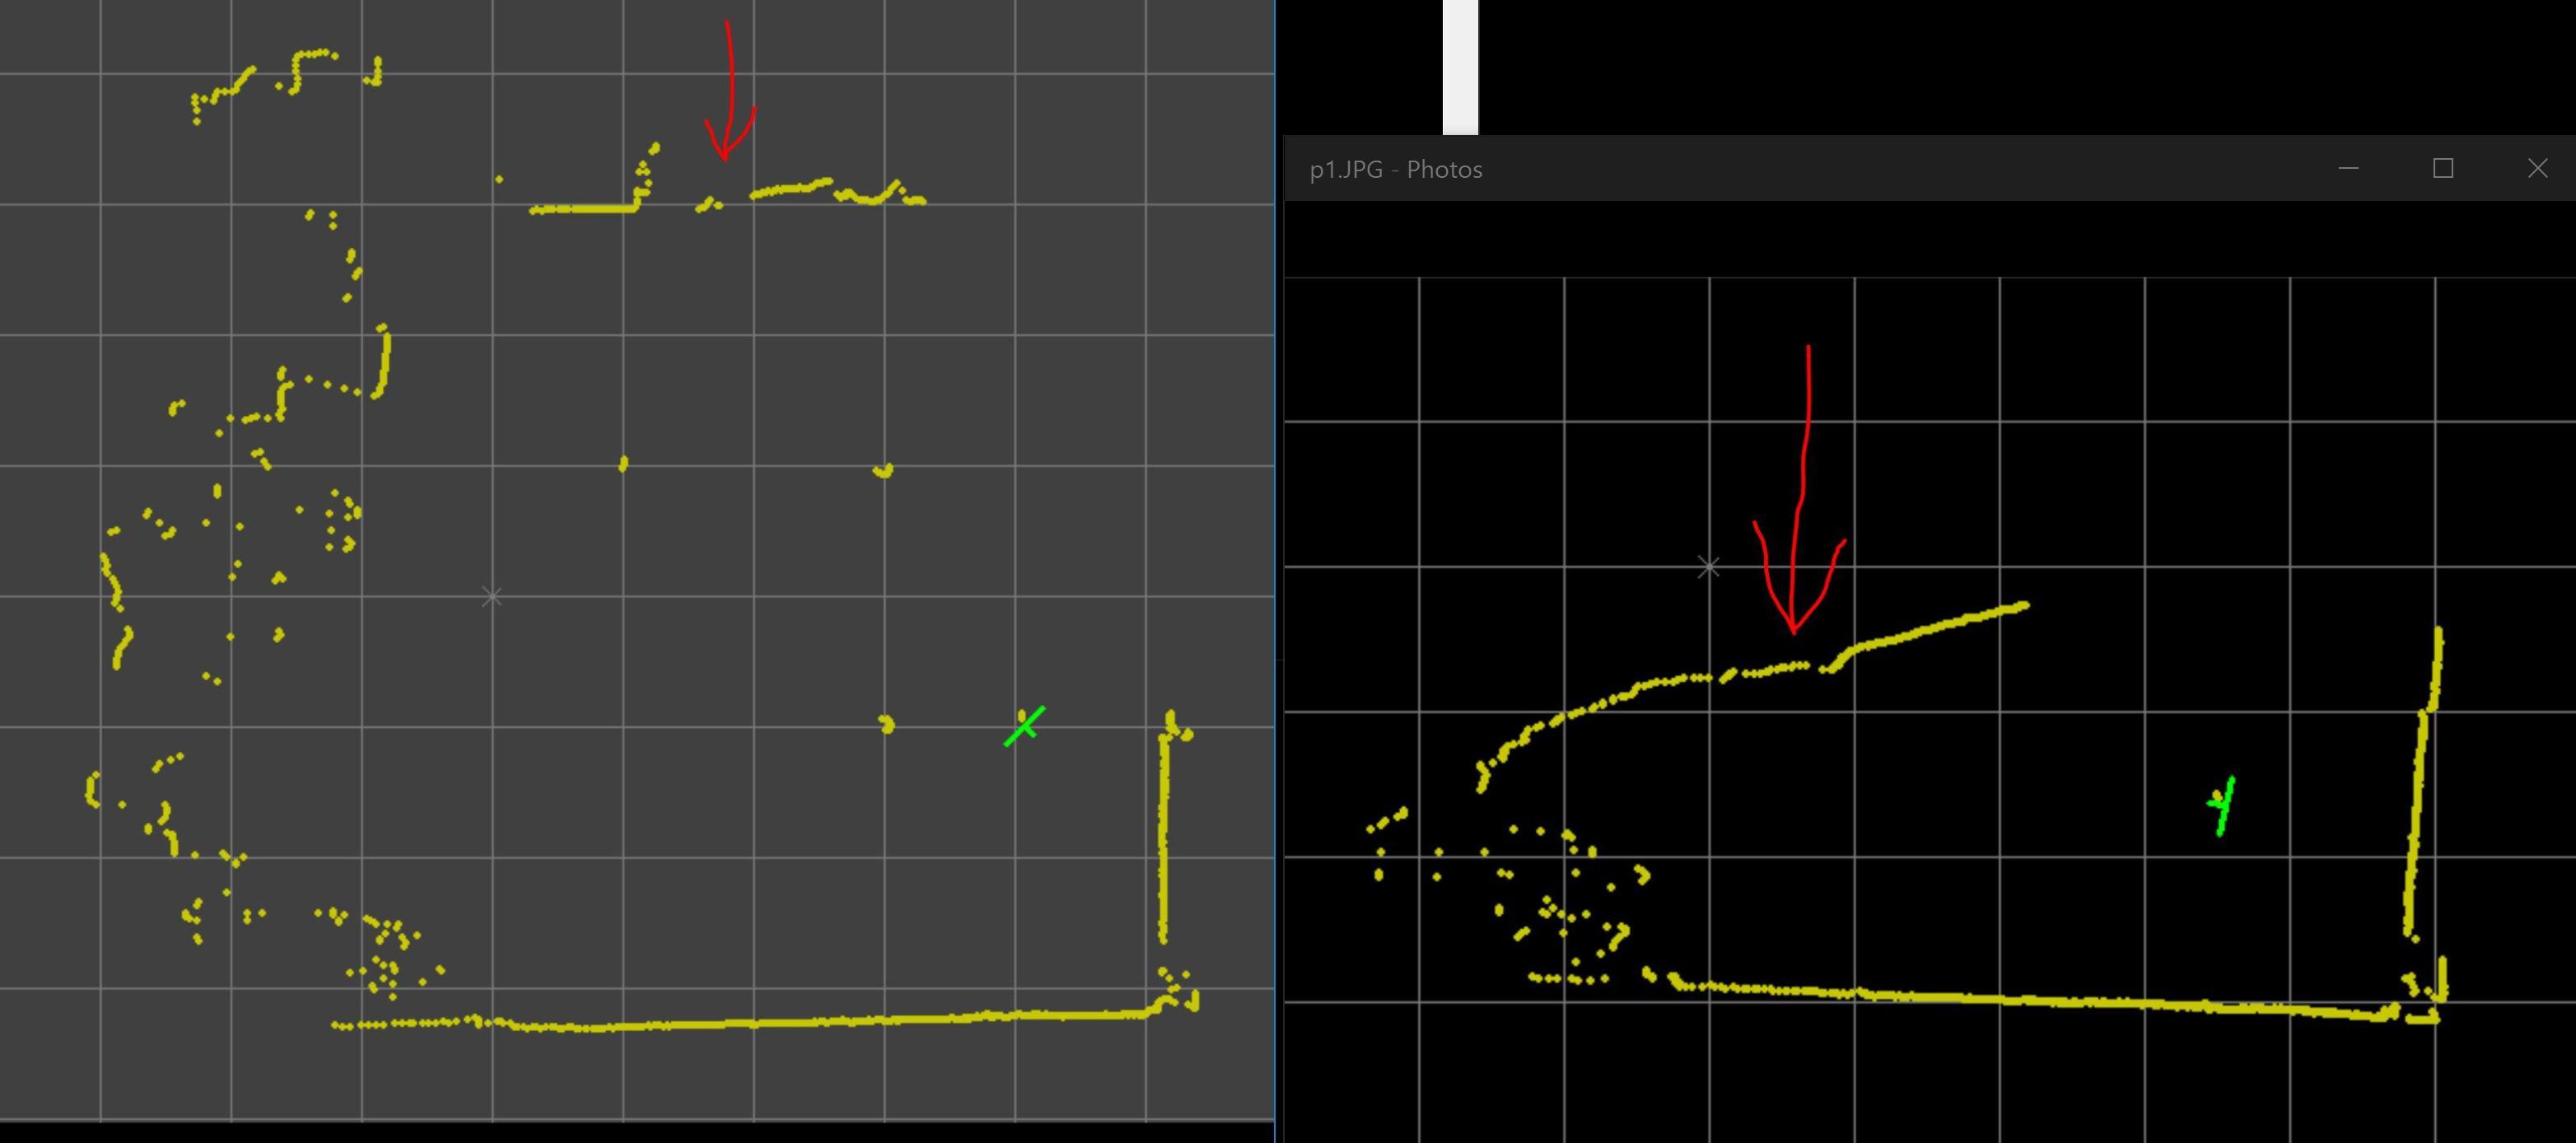 hokuyo UST-10lx LiDAR data not consistent - ROS Answers